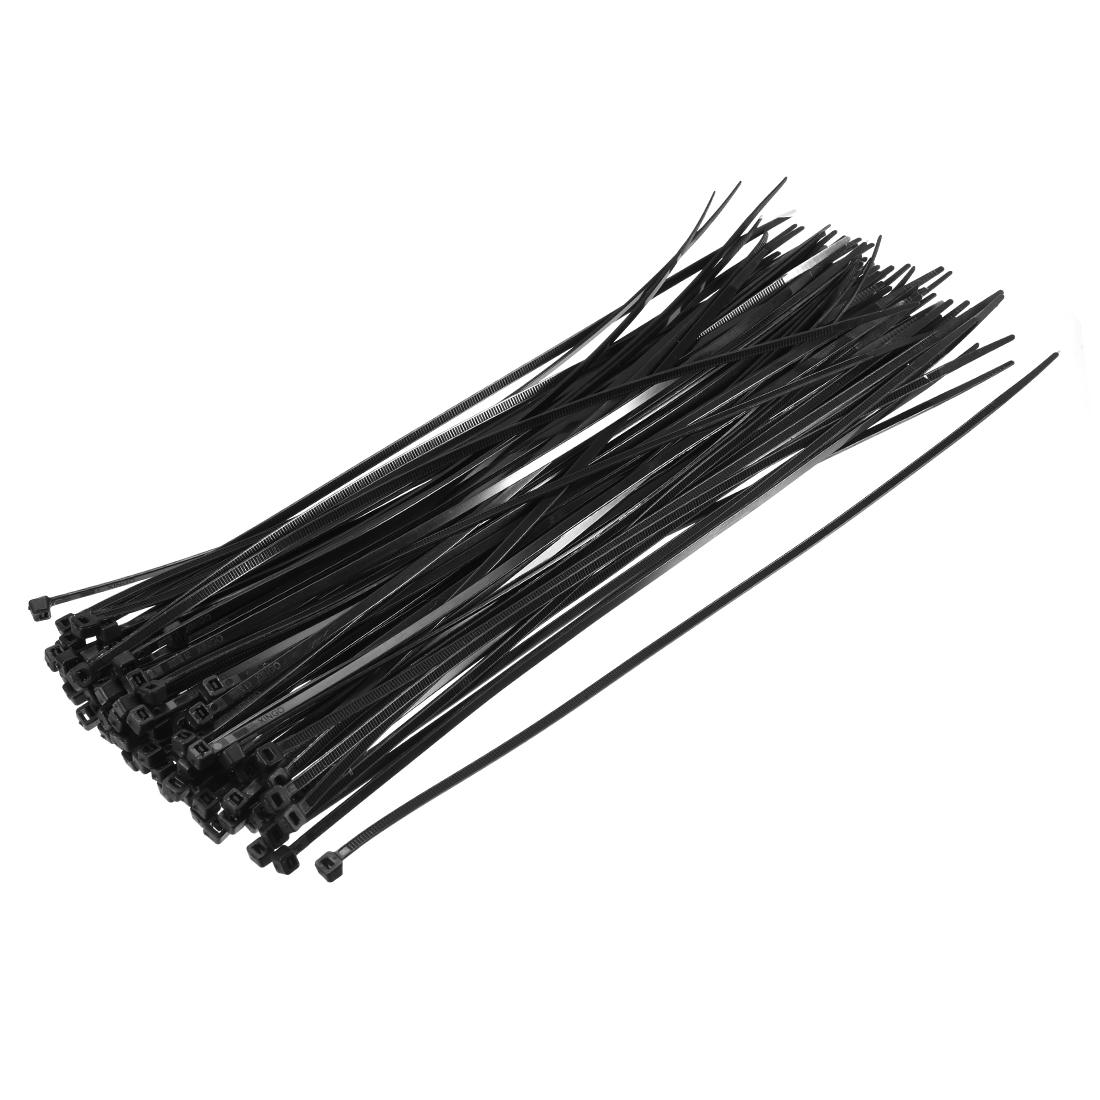 Cable Zip Ties 250mmx2.8mm Self-Locking Nylon Tie Wraps Black 150pcs